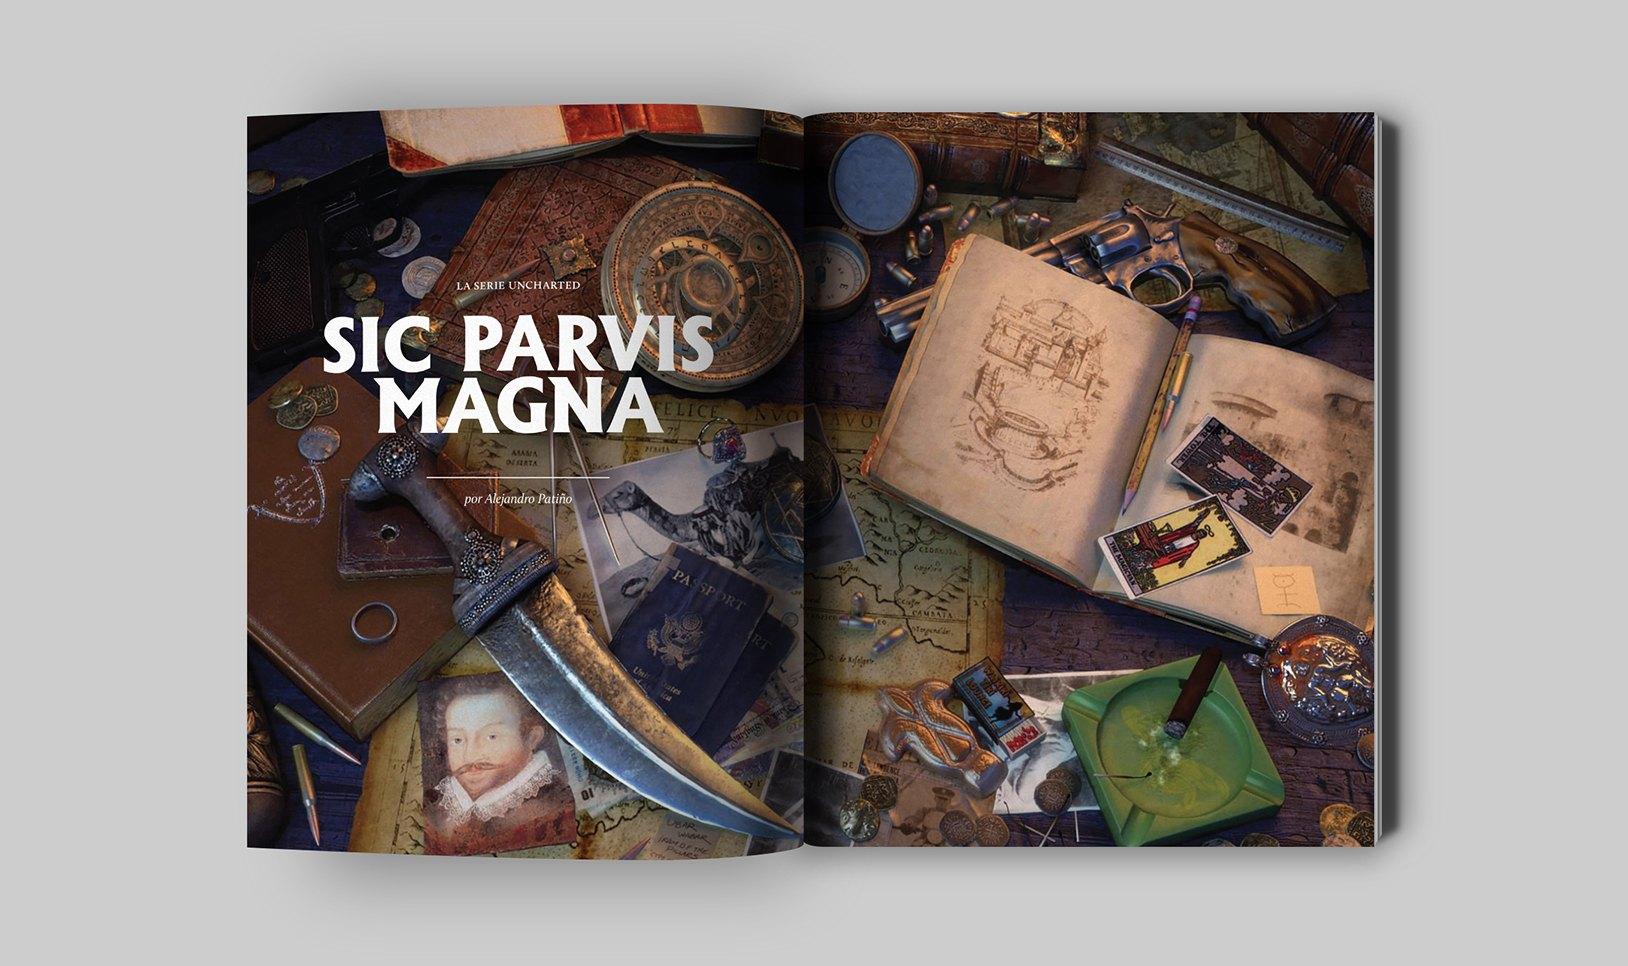 Sic Parvis Magna